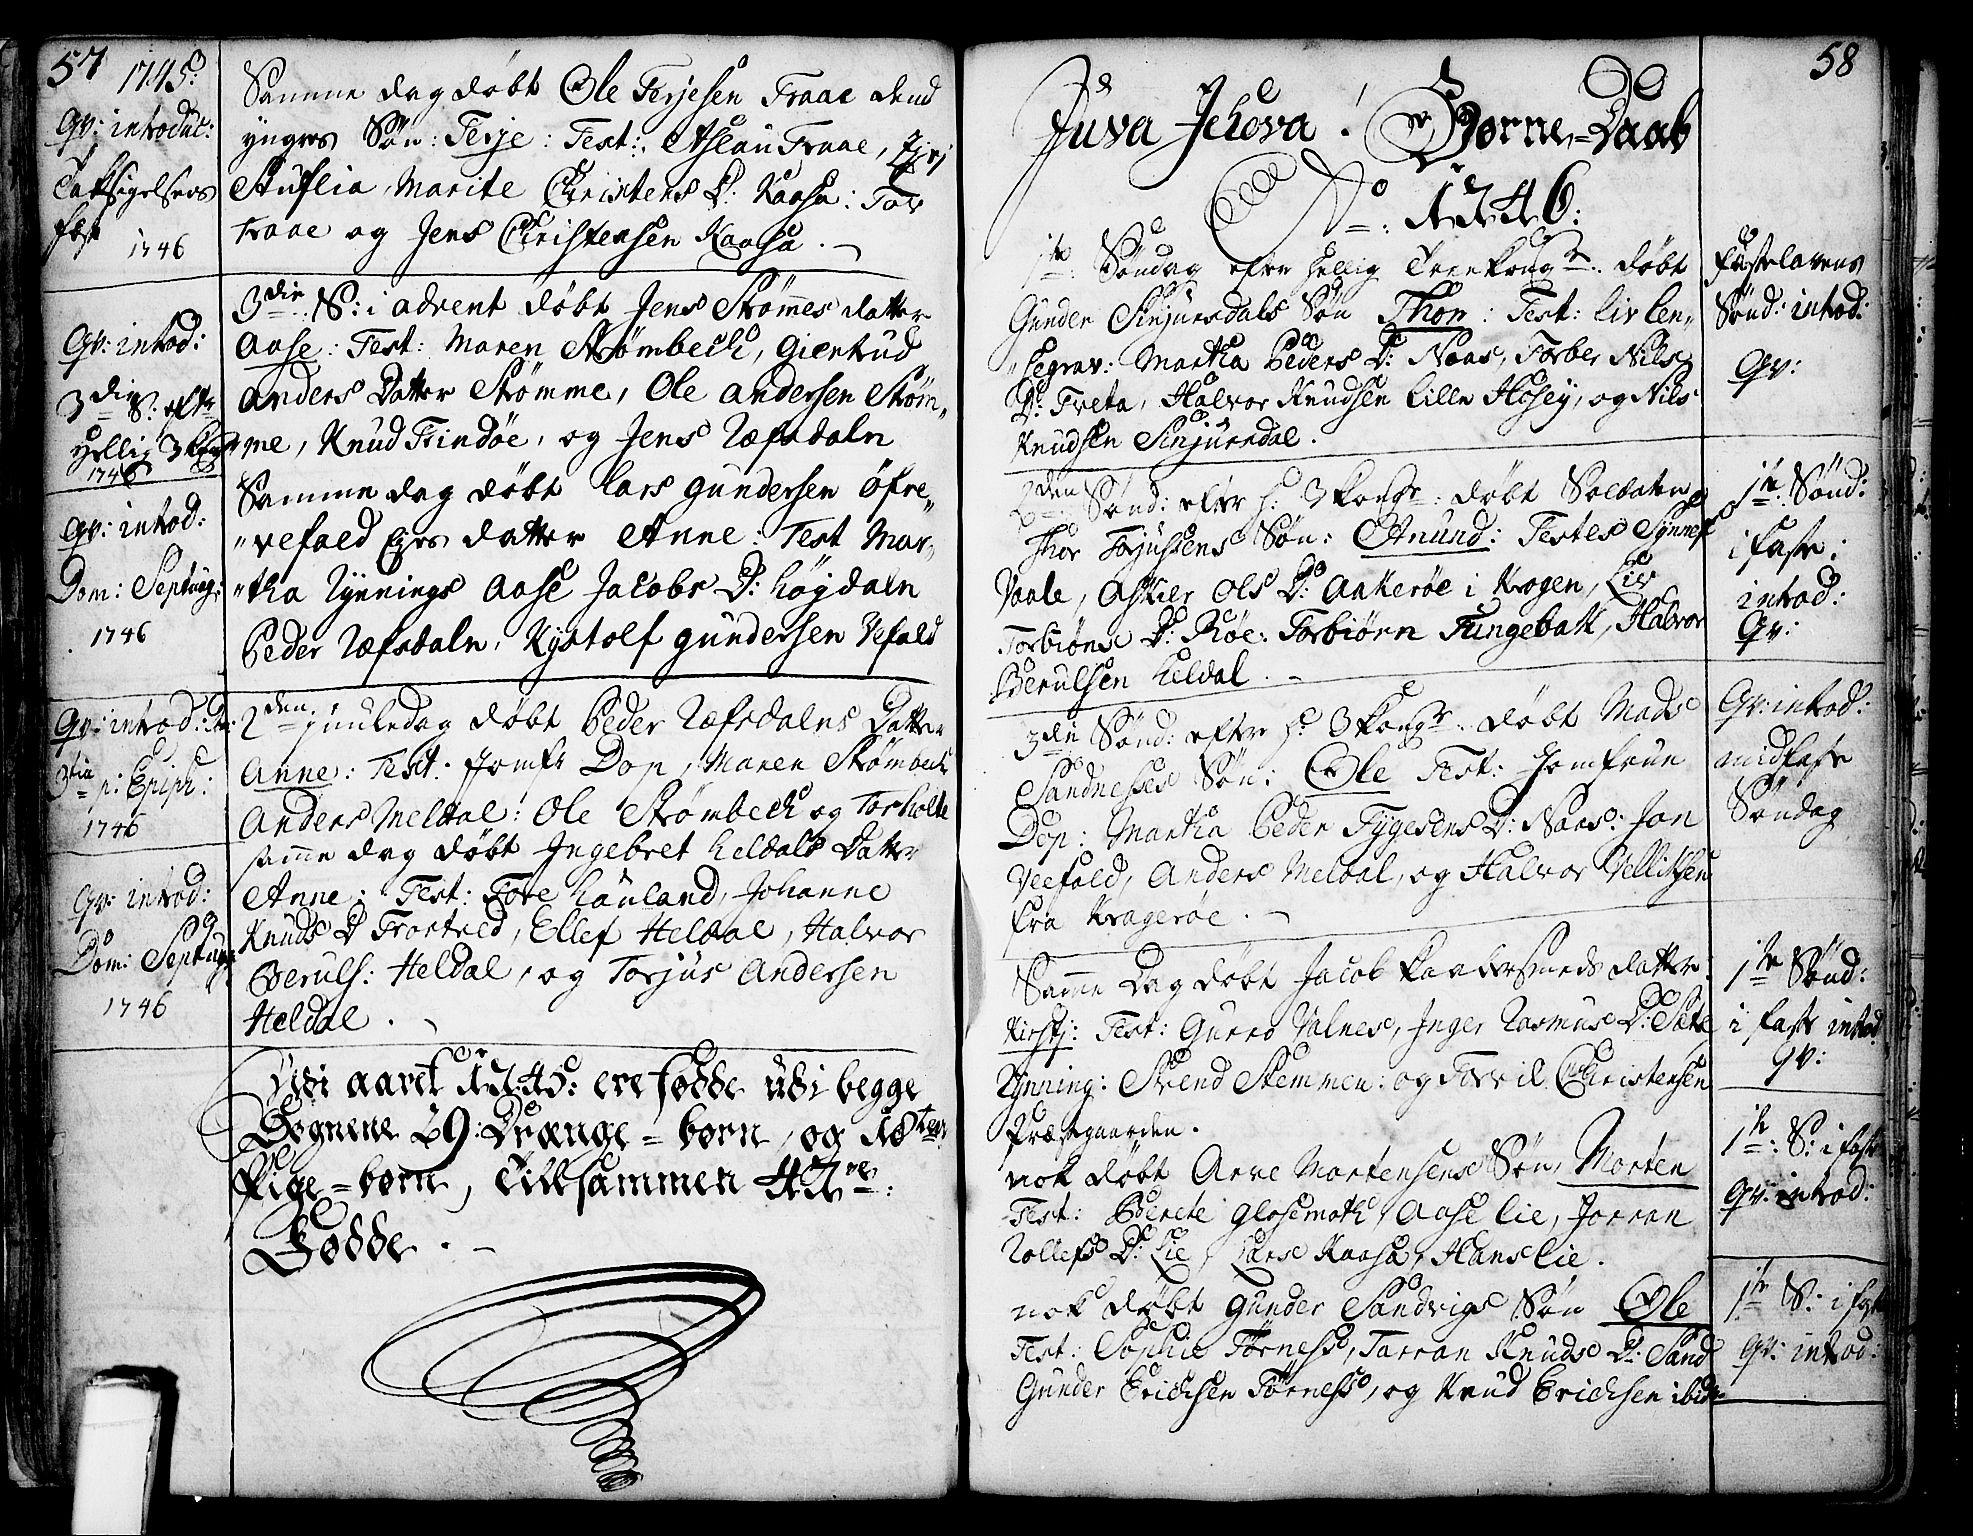 SAKO, Drangedal kirkebøker, F/Fa/L0002: Ministerialbok nr. 2, 1733-1753, s. 57-58